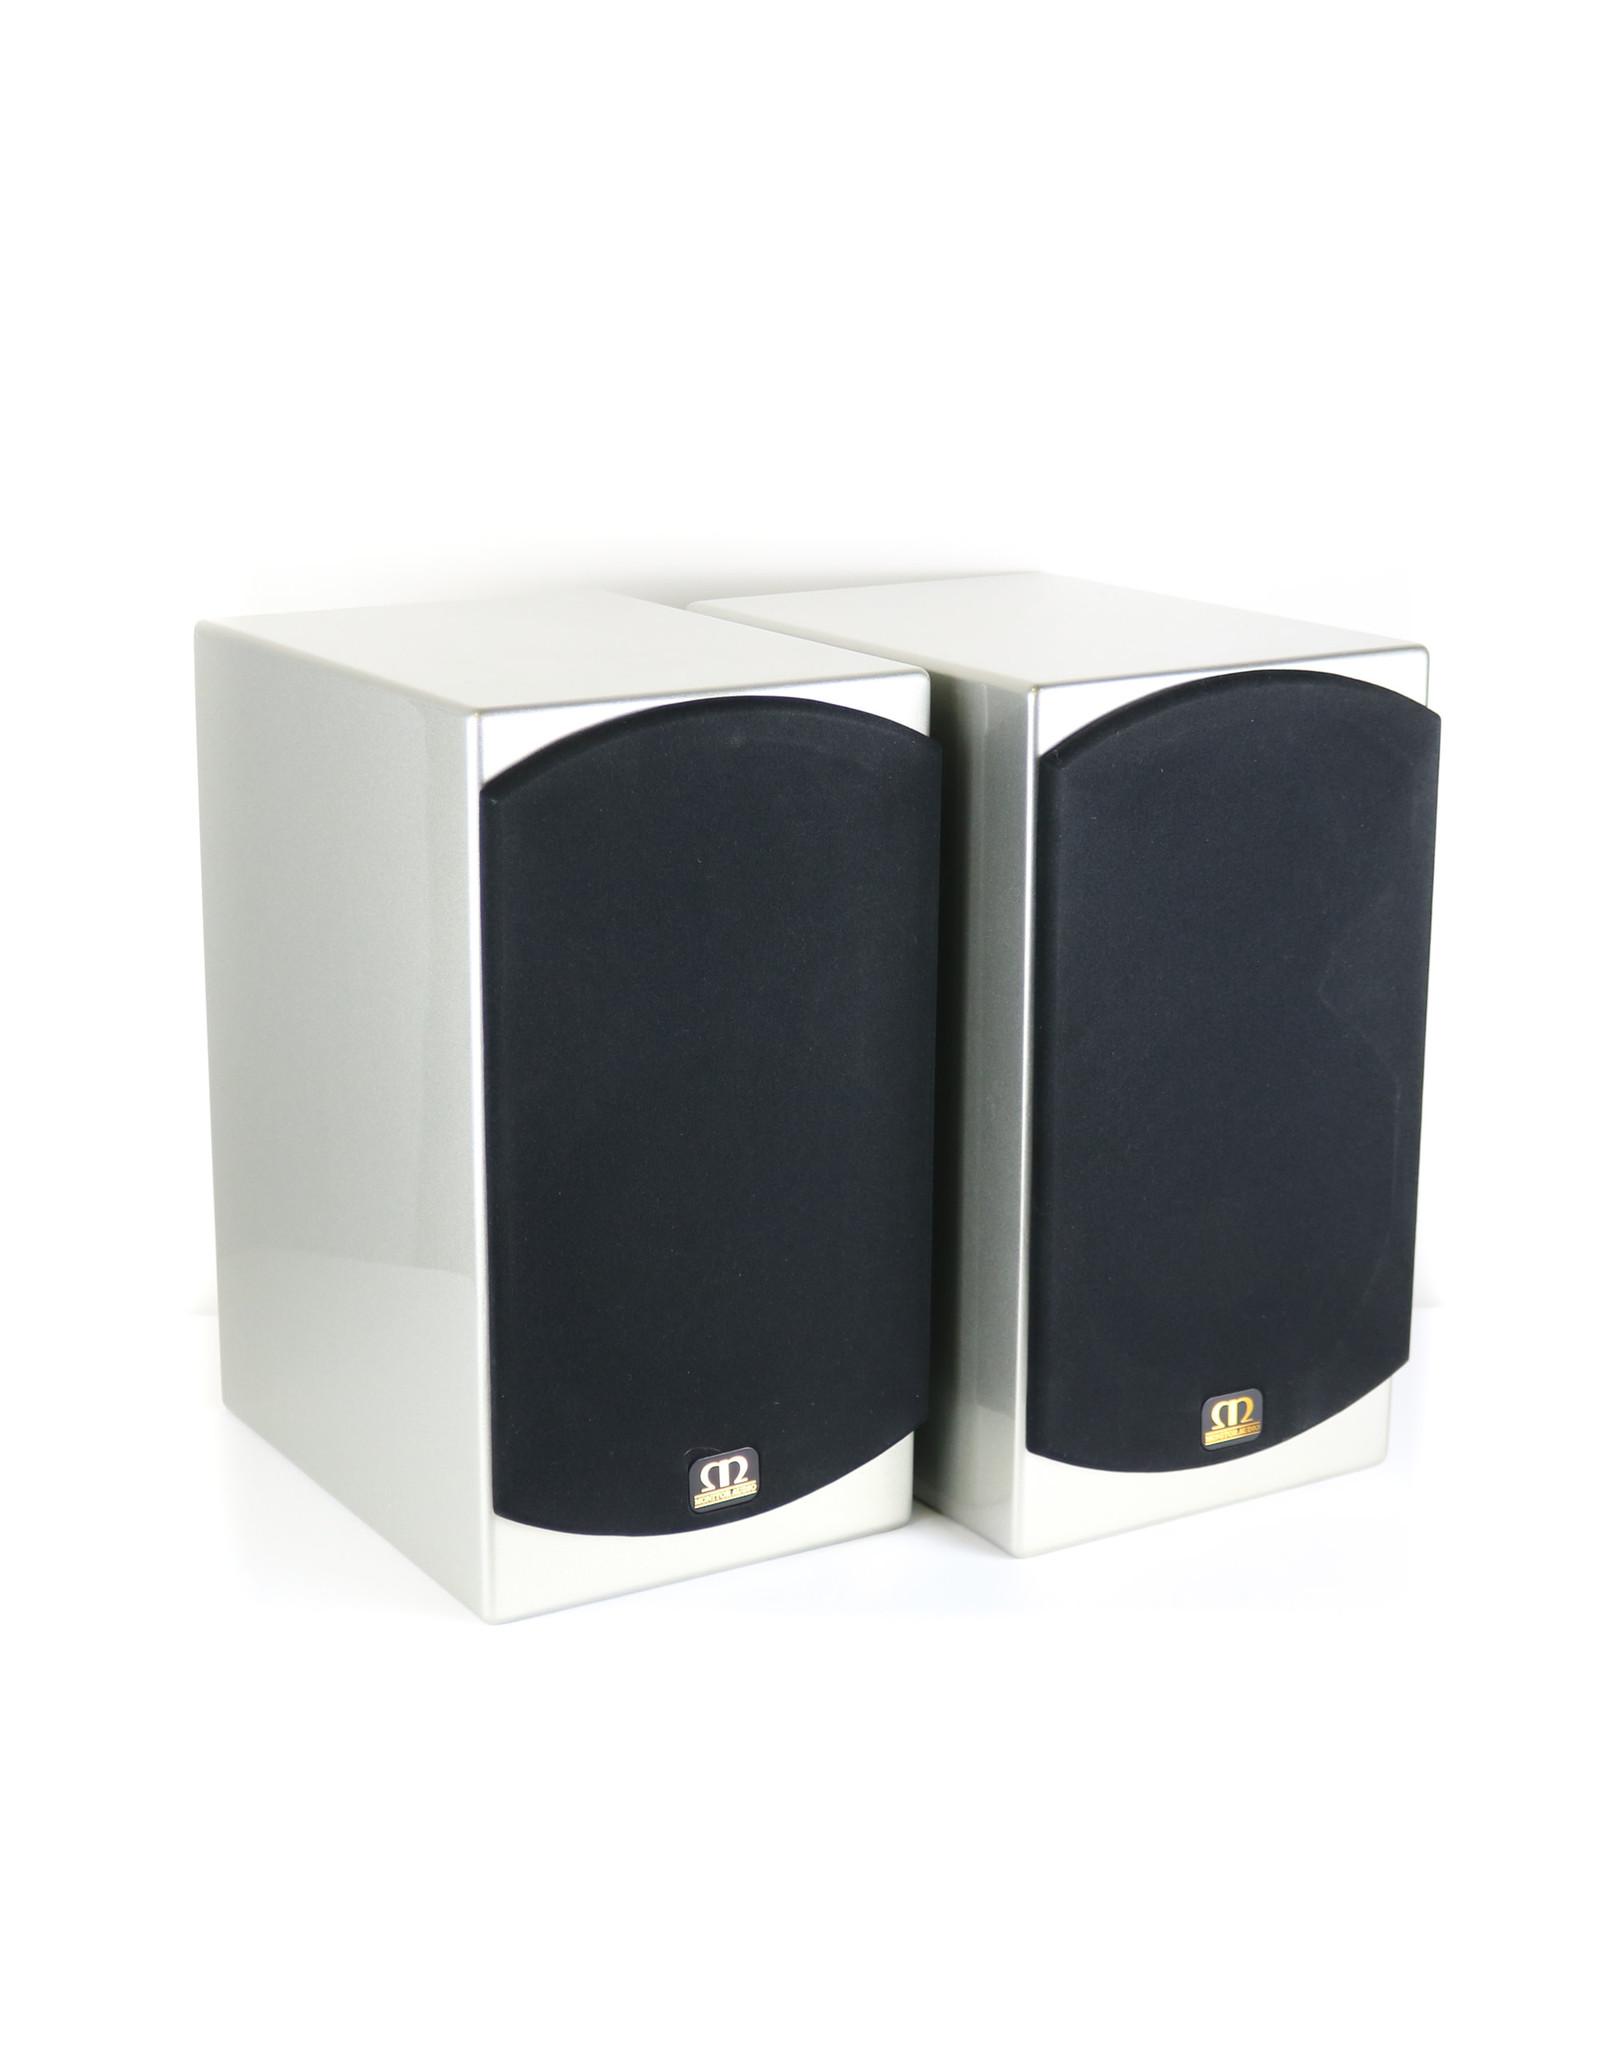 Monitor Audio Monitor Audio Gold 10 Bookshelf Speakers USED